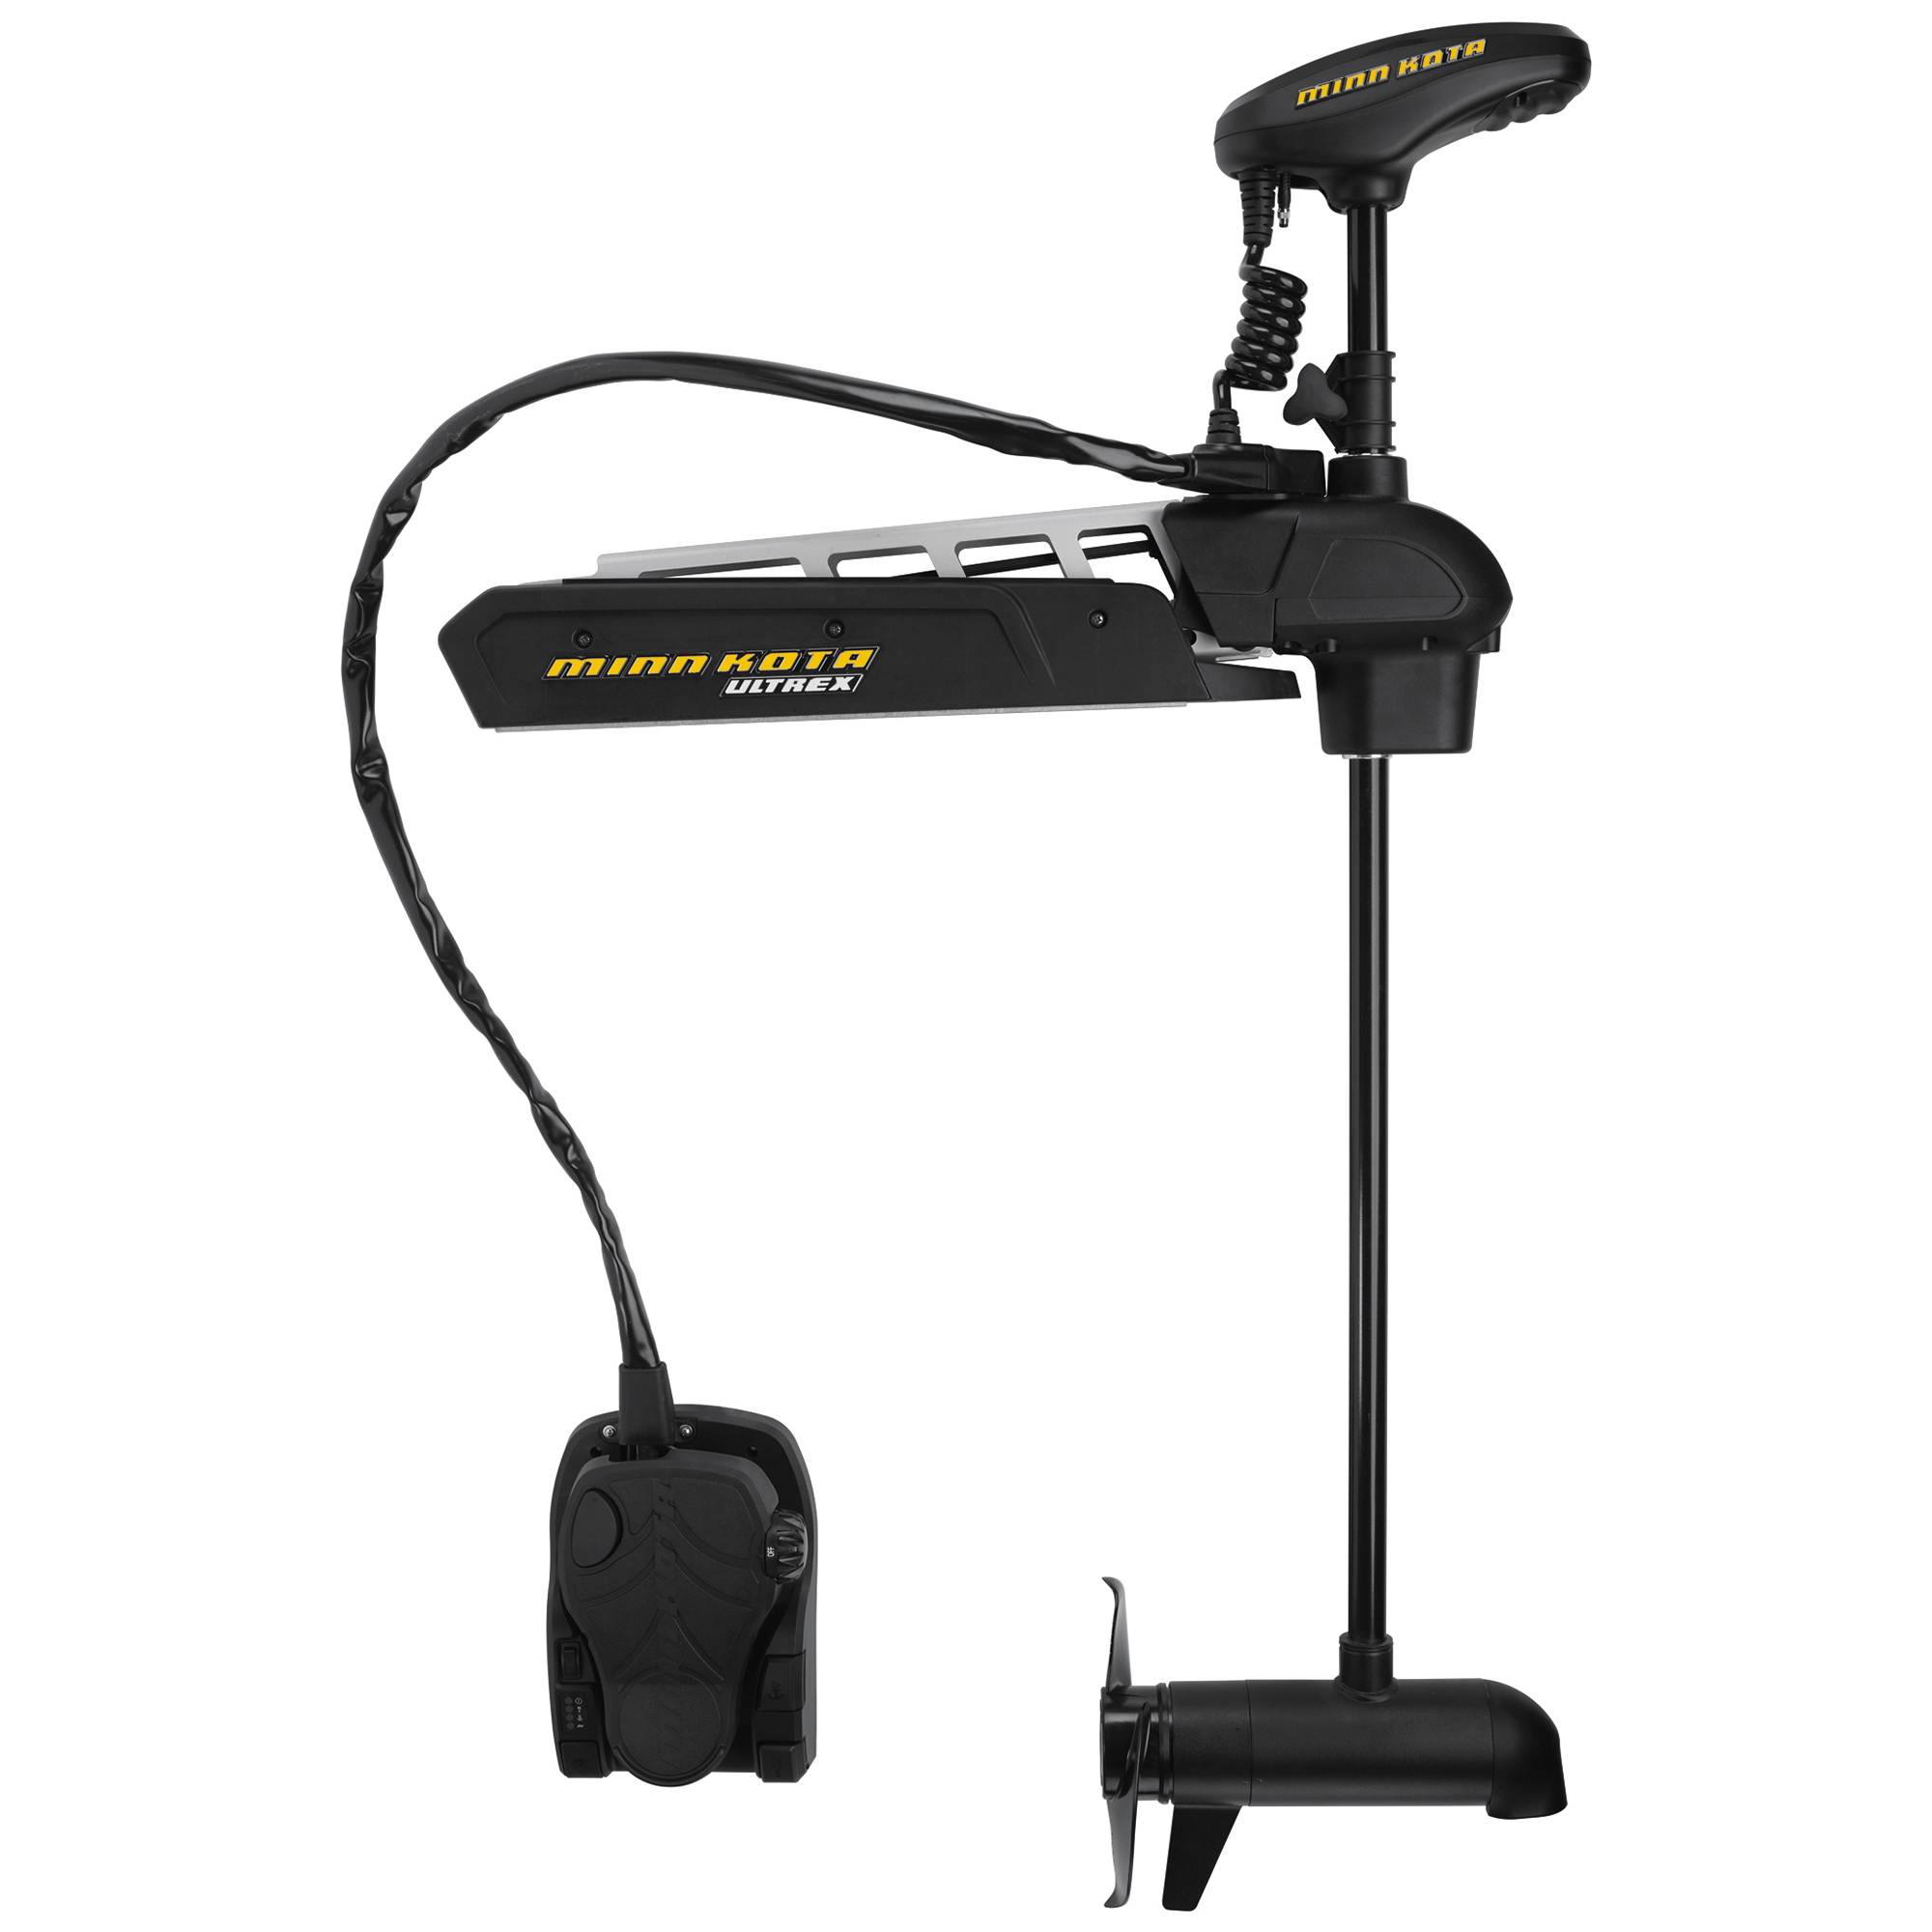 Minn Kota Ultrex i-Pilot Link Bluetooth US2 Freshwater Bow-Mount Trolling Motor